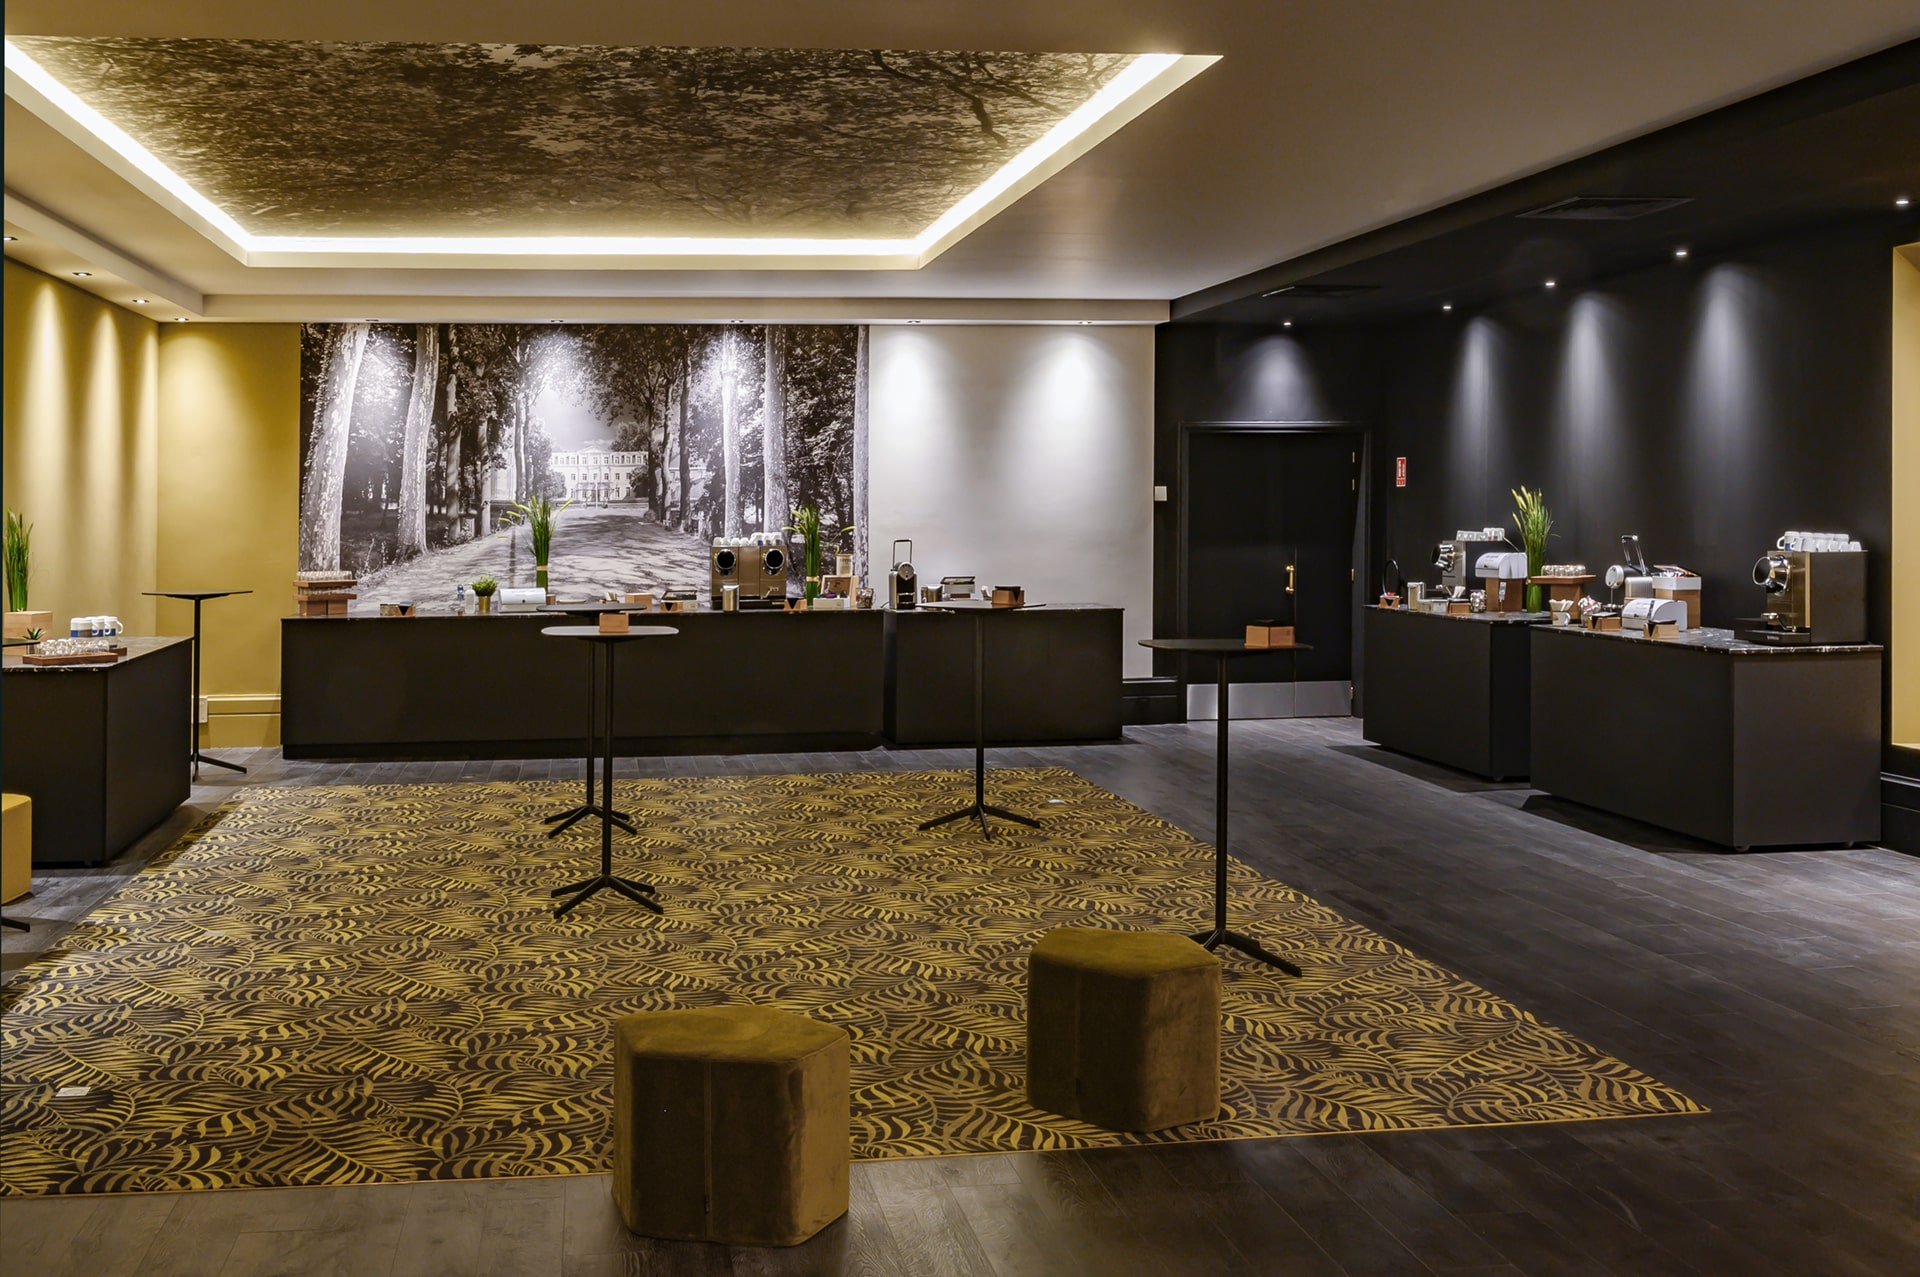 Architecte à Lille - Renovation hotel seminaire VR-architecture 6